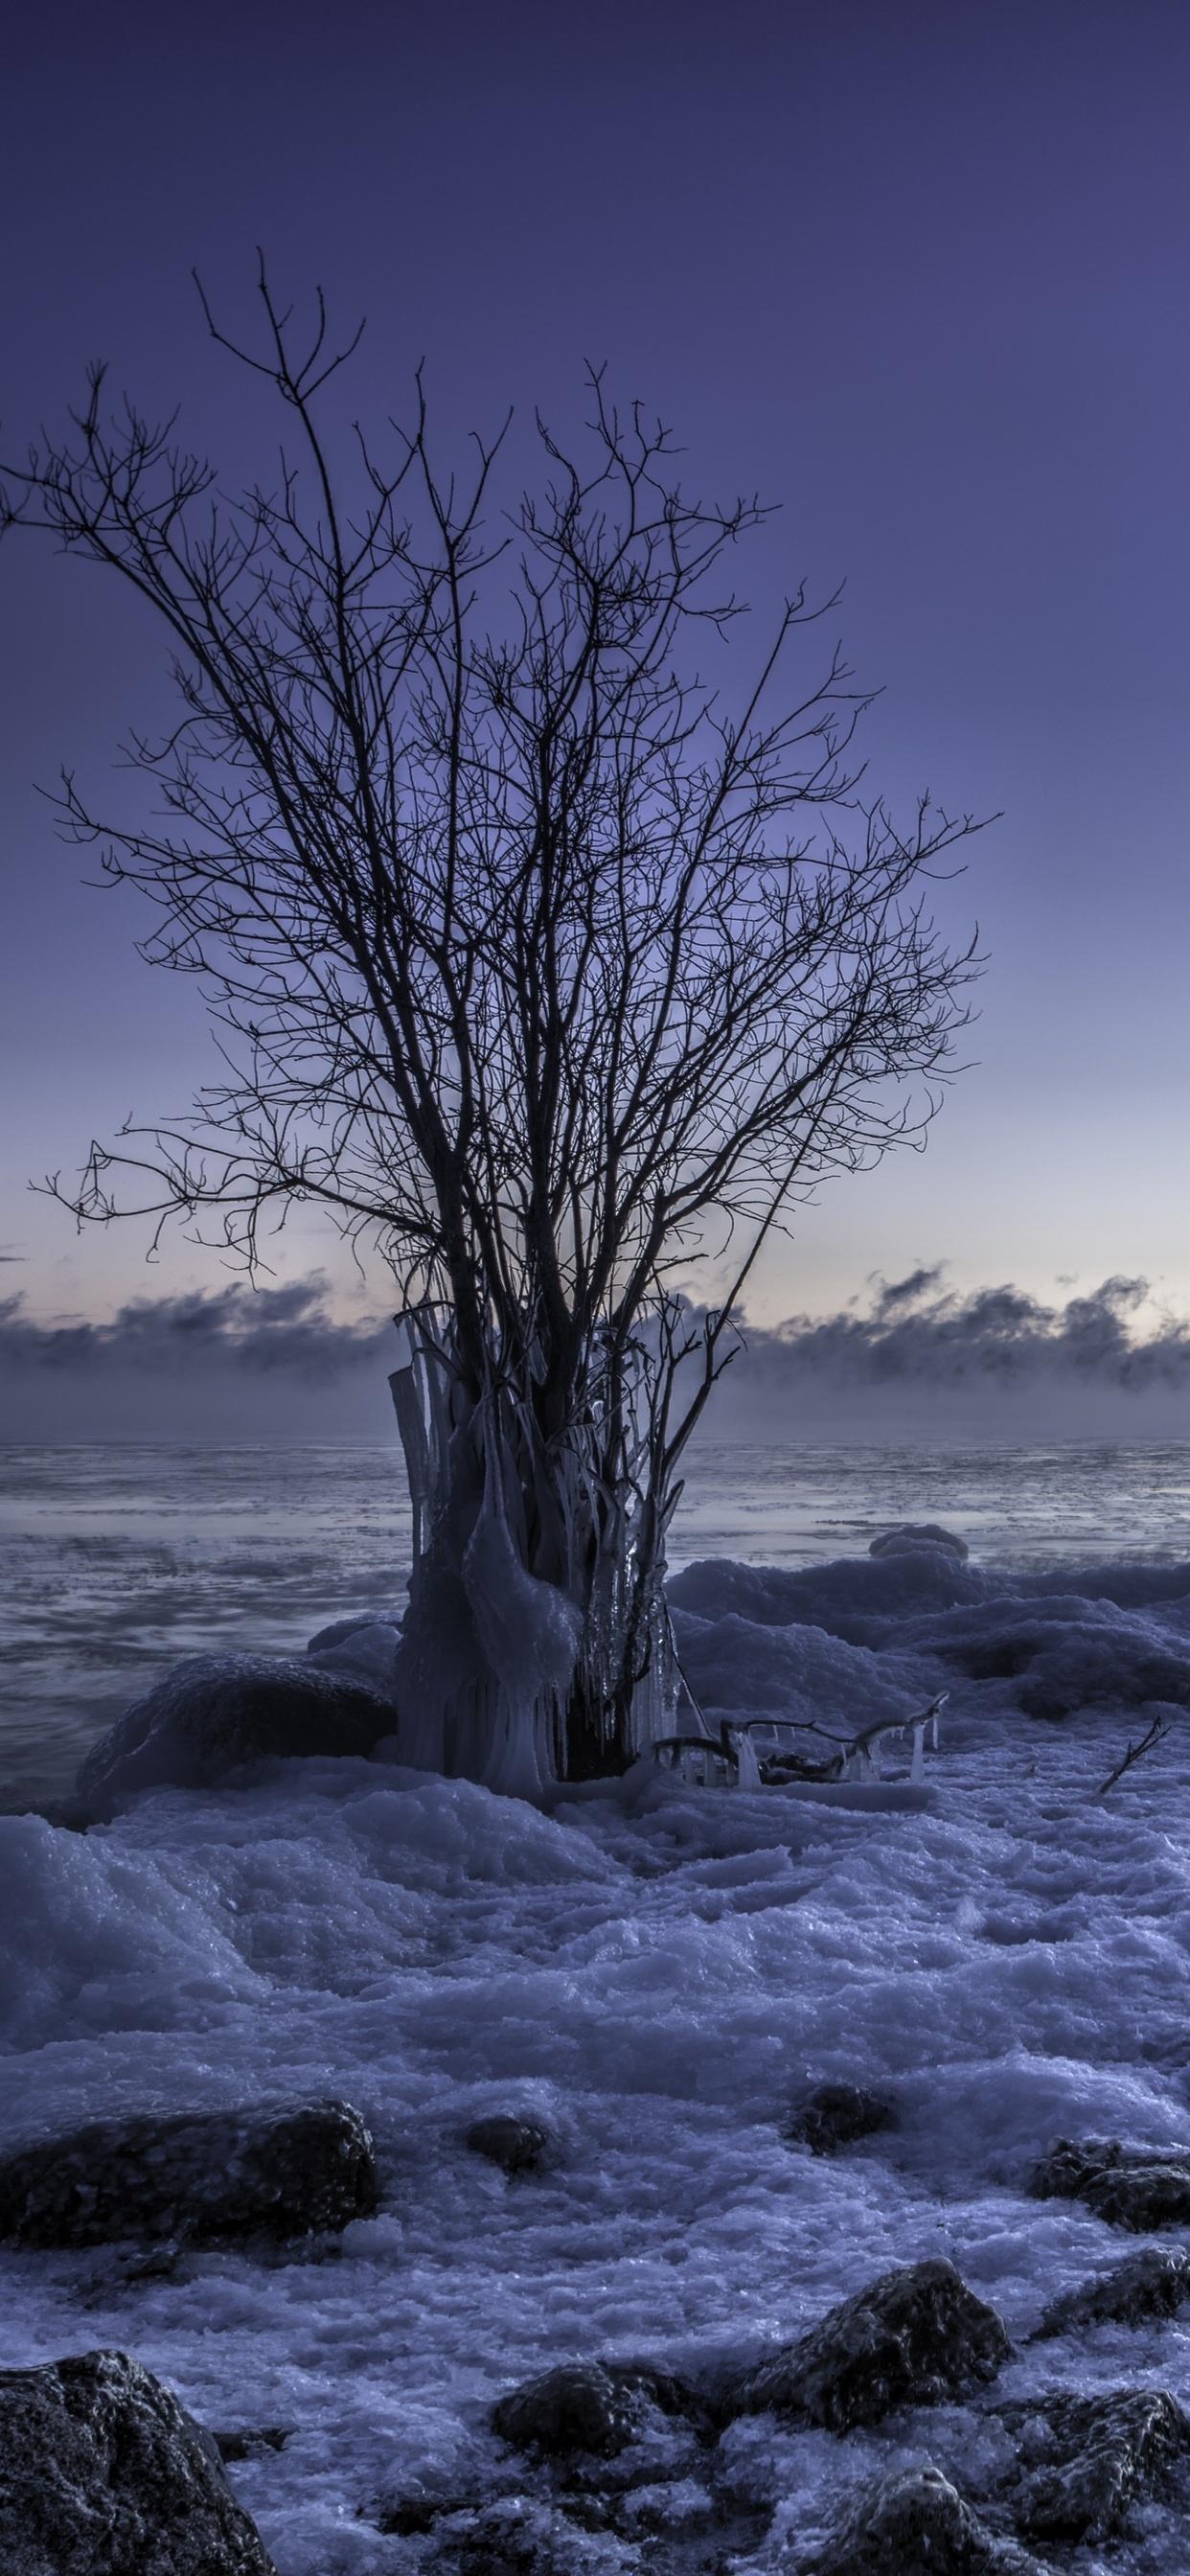 1242x2688 Frozen Winter Snow Landscape Iphone Xs Max Hd 4k